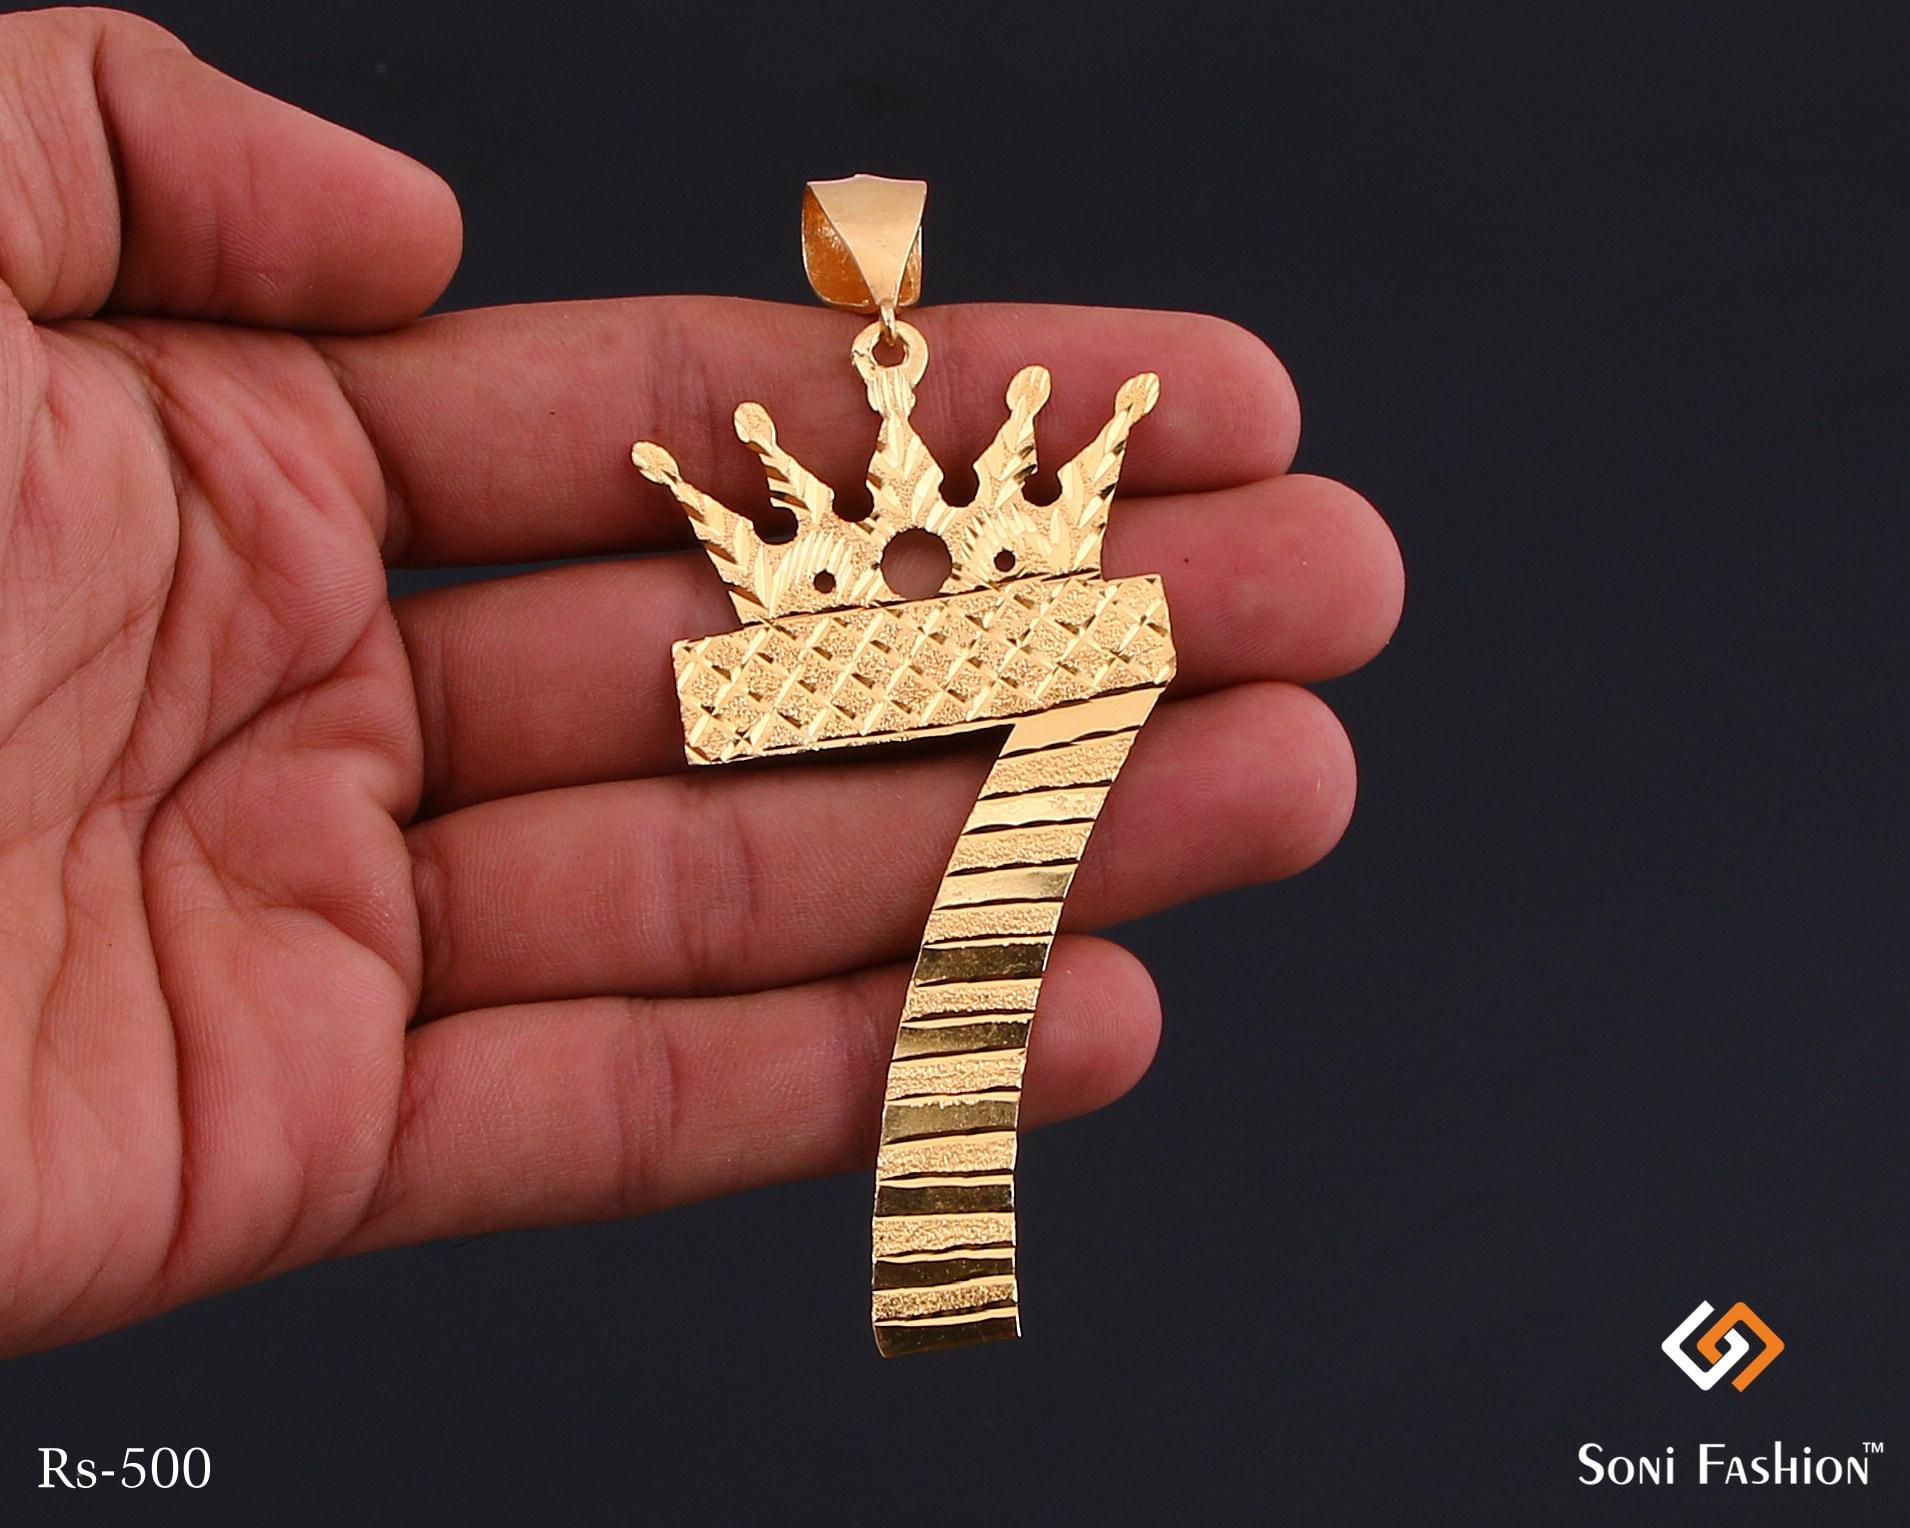 King 7 Number Golden Pendant For Men